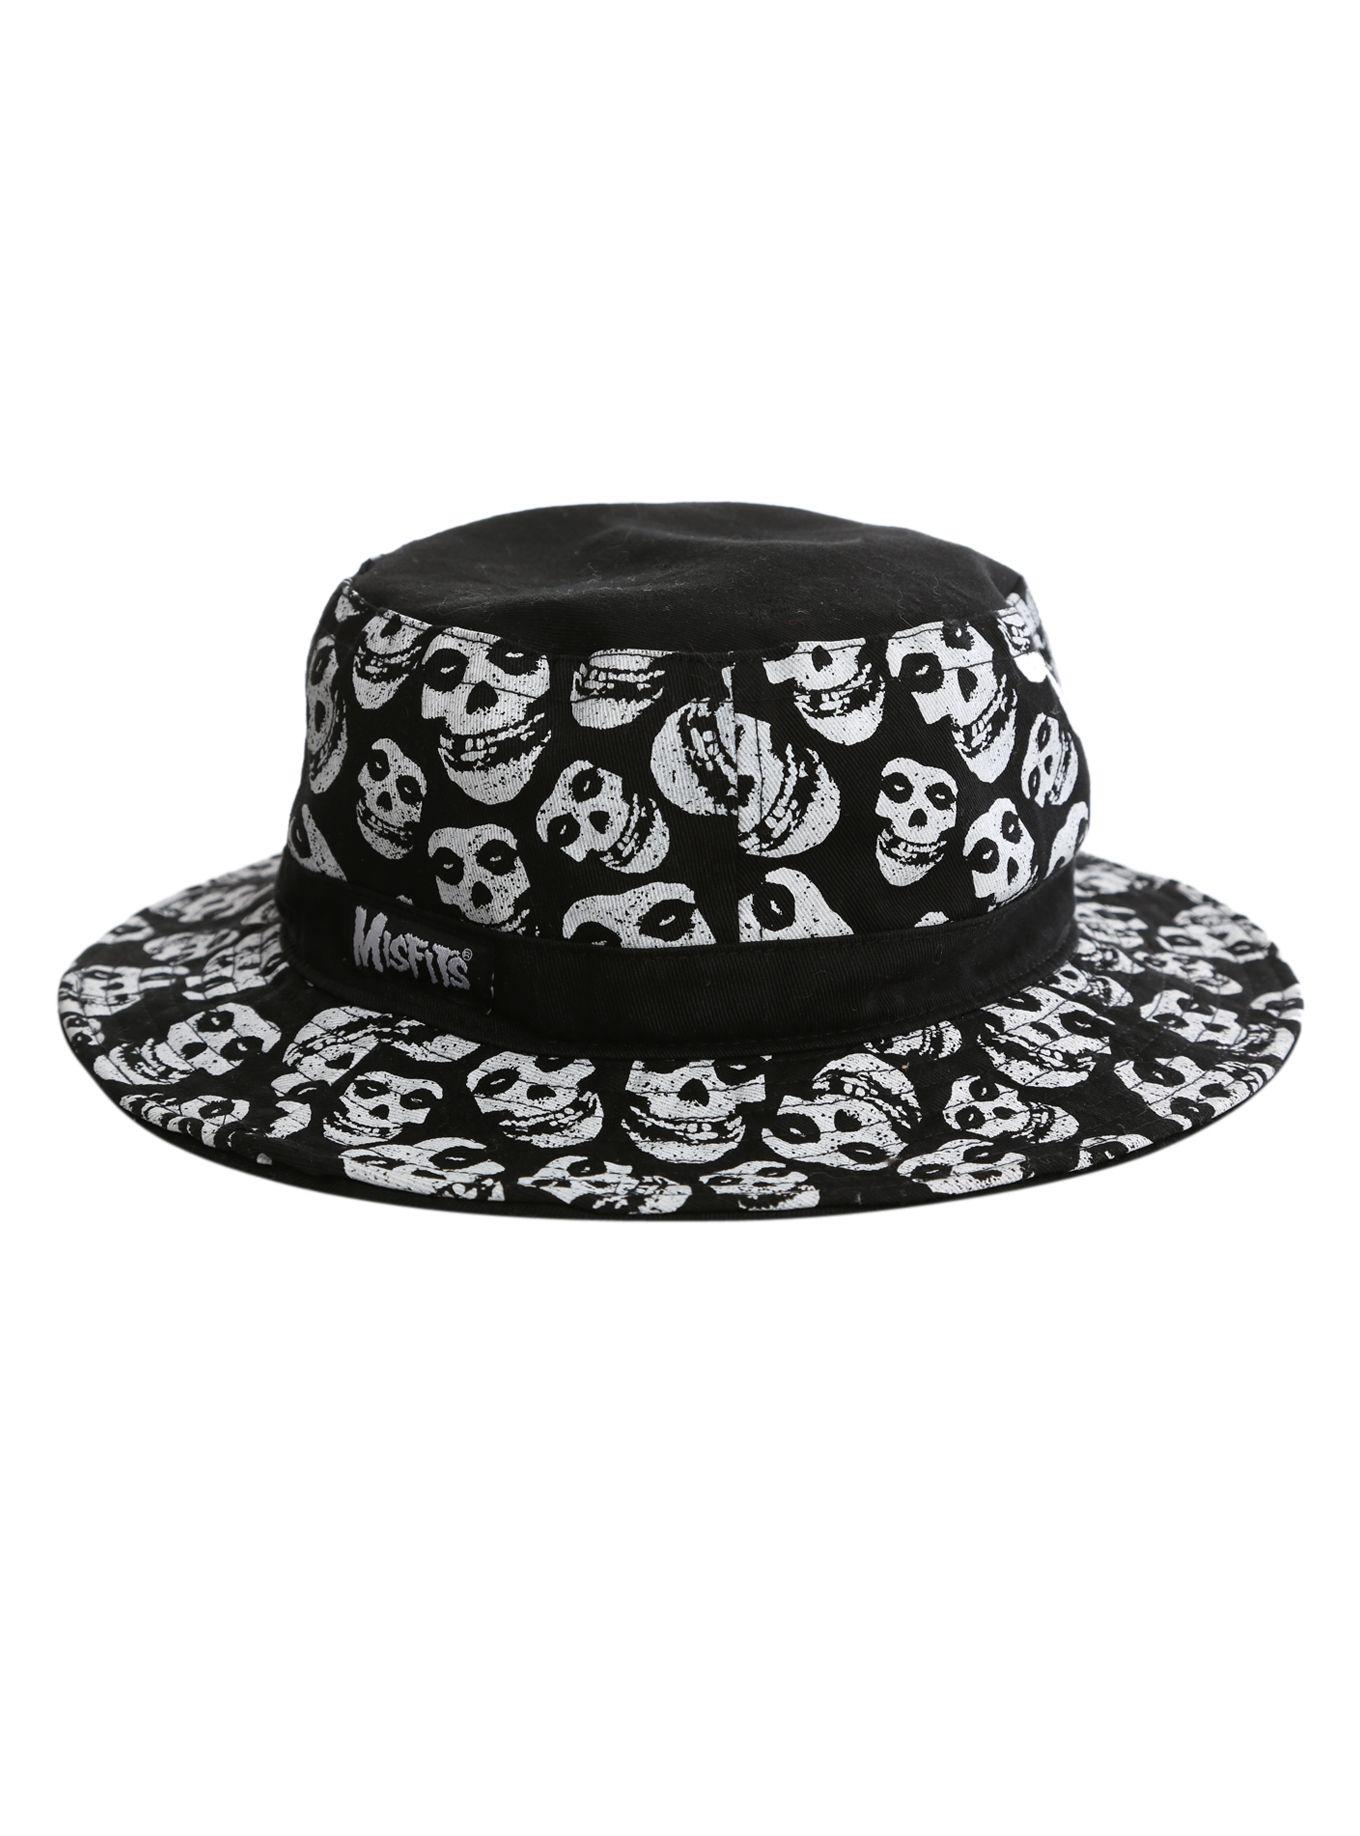 Misfits bucket hat  e364da36f27